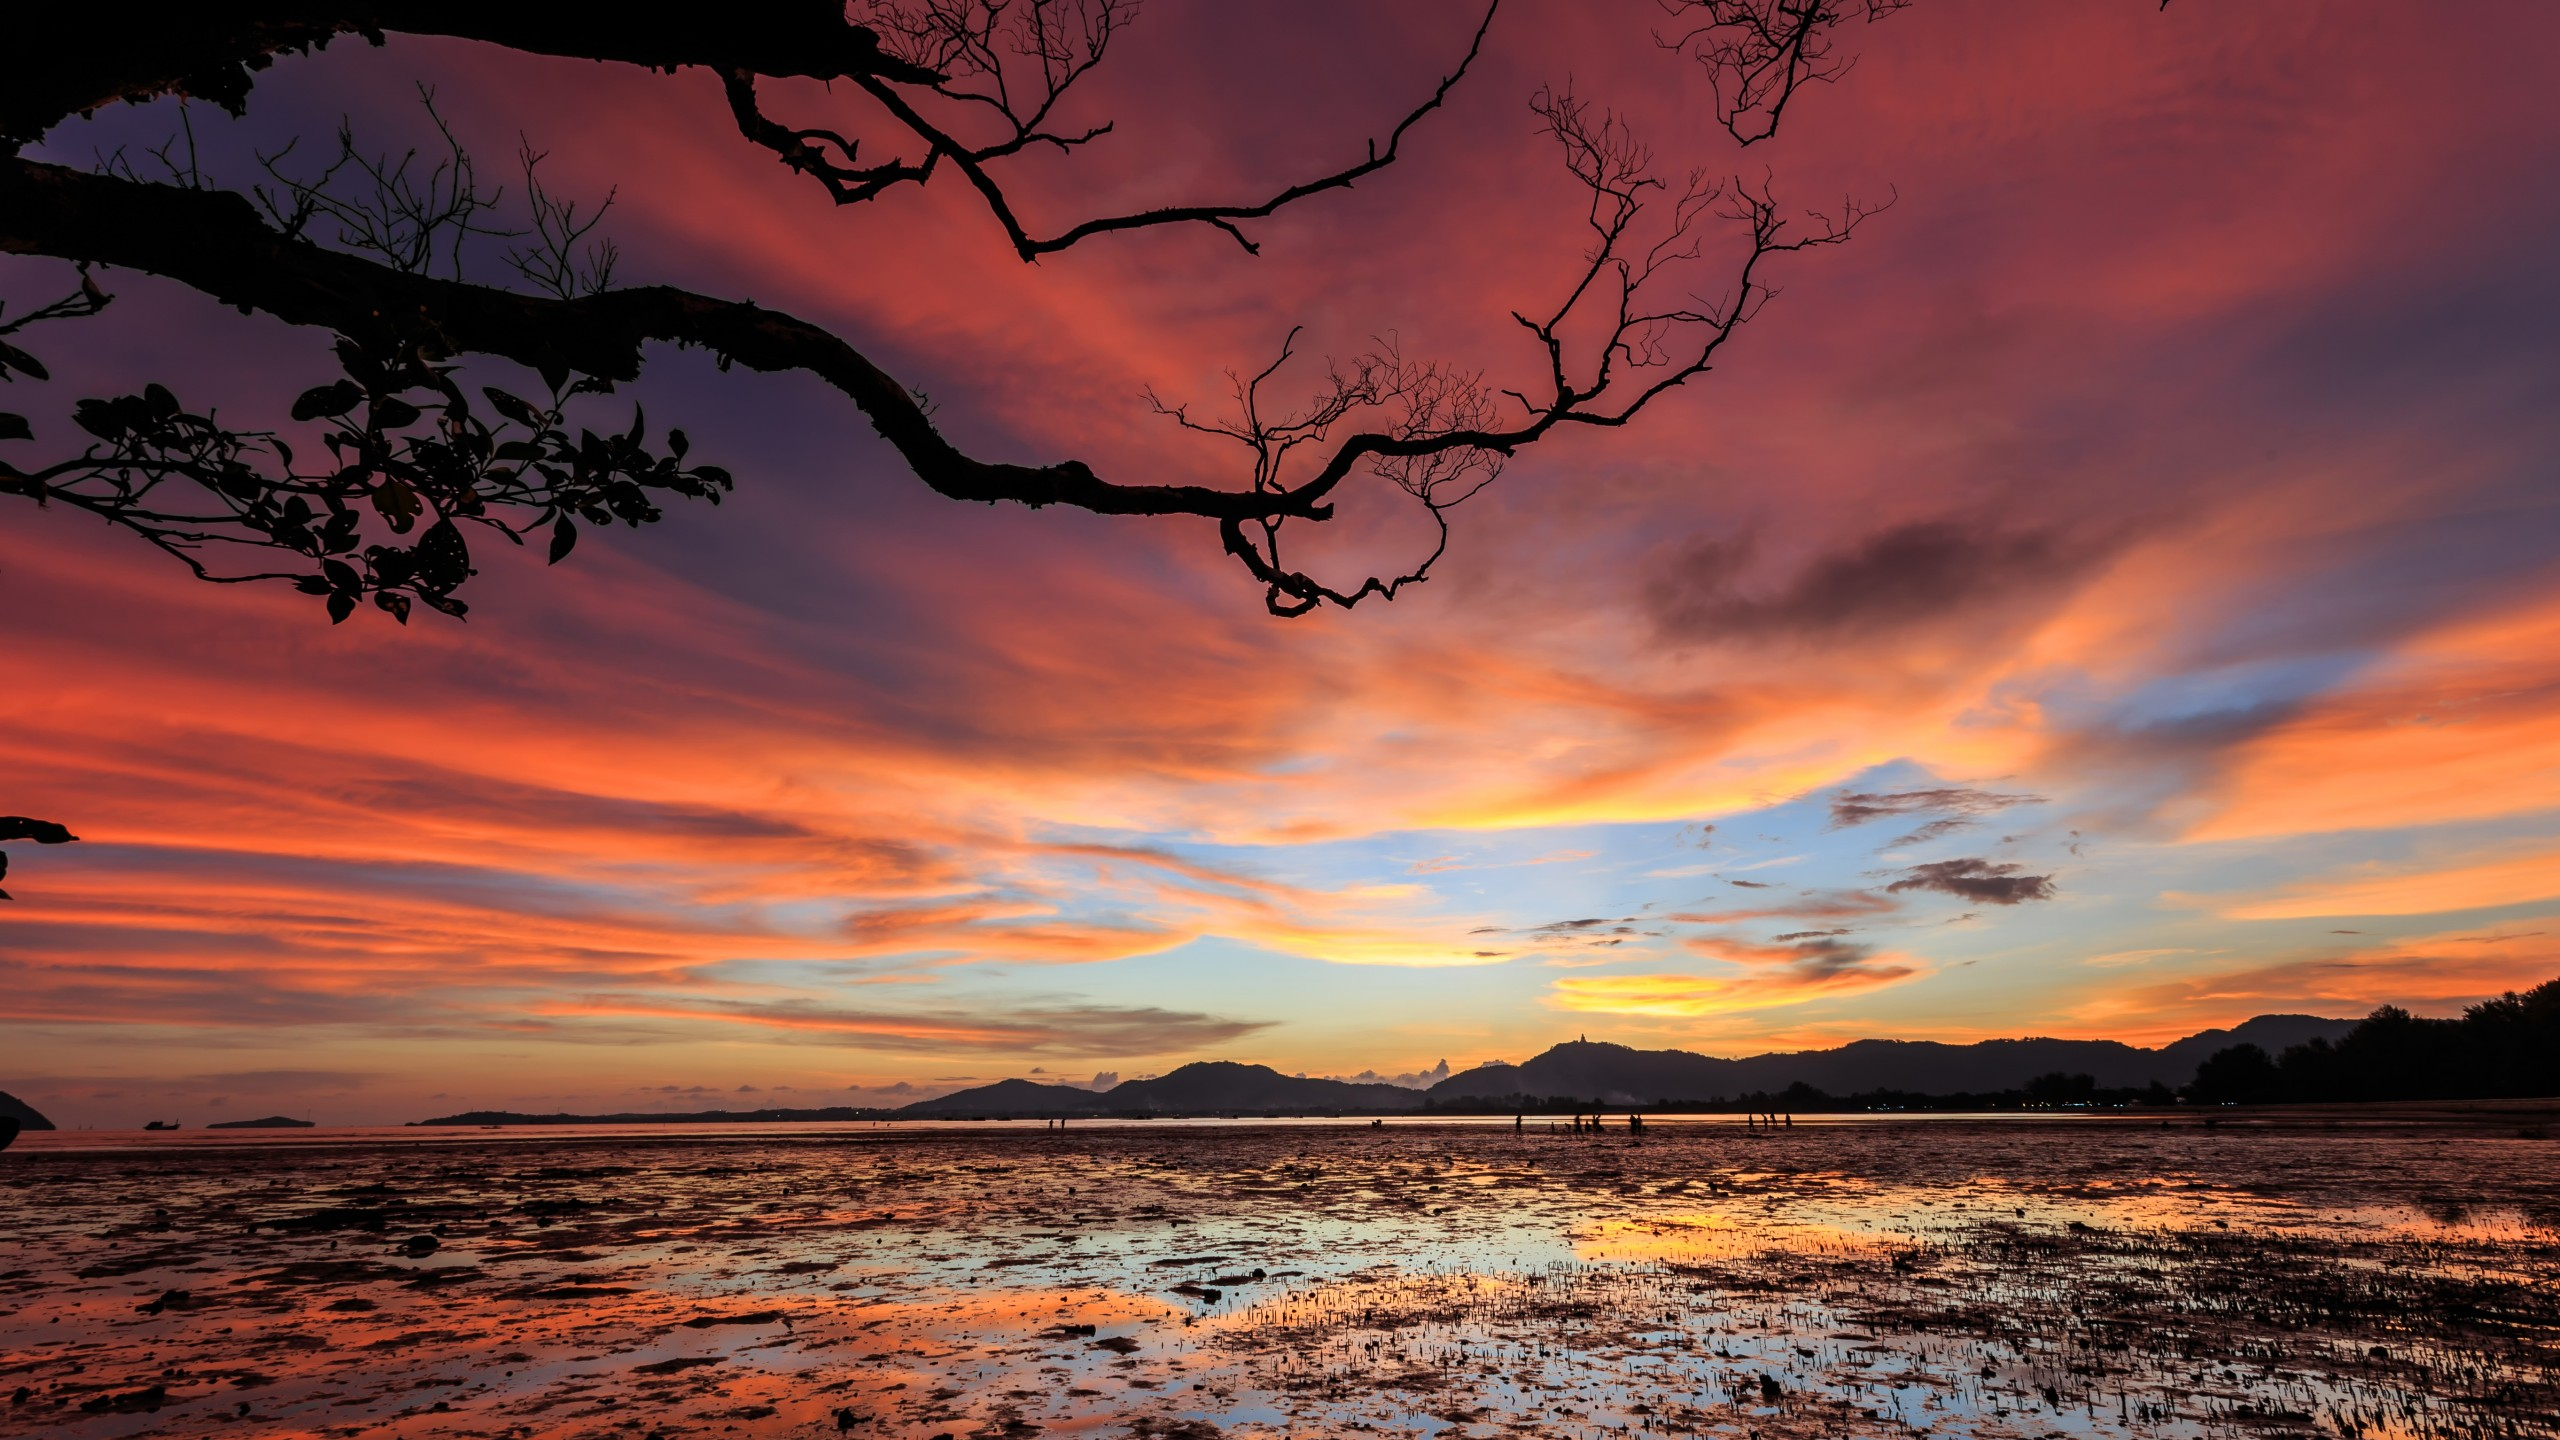 Wallpaper Sunset, Clouds, 5K, Nature #19547